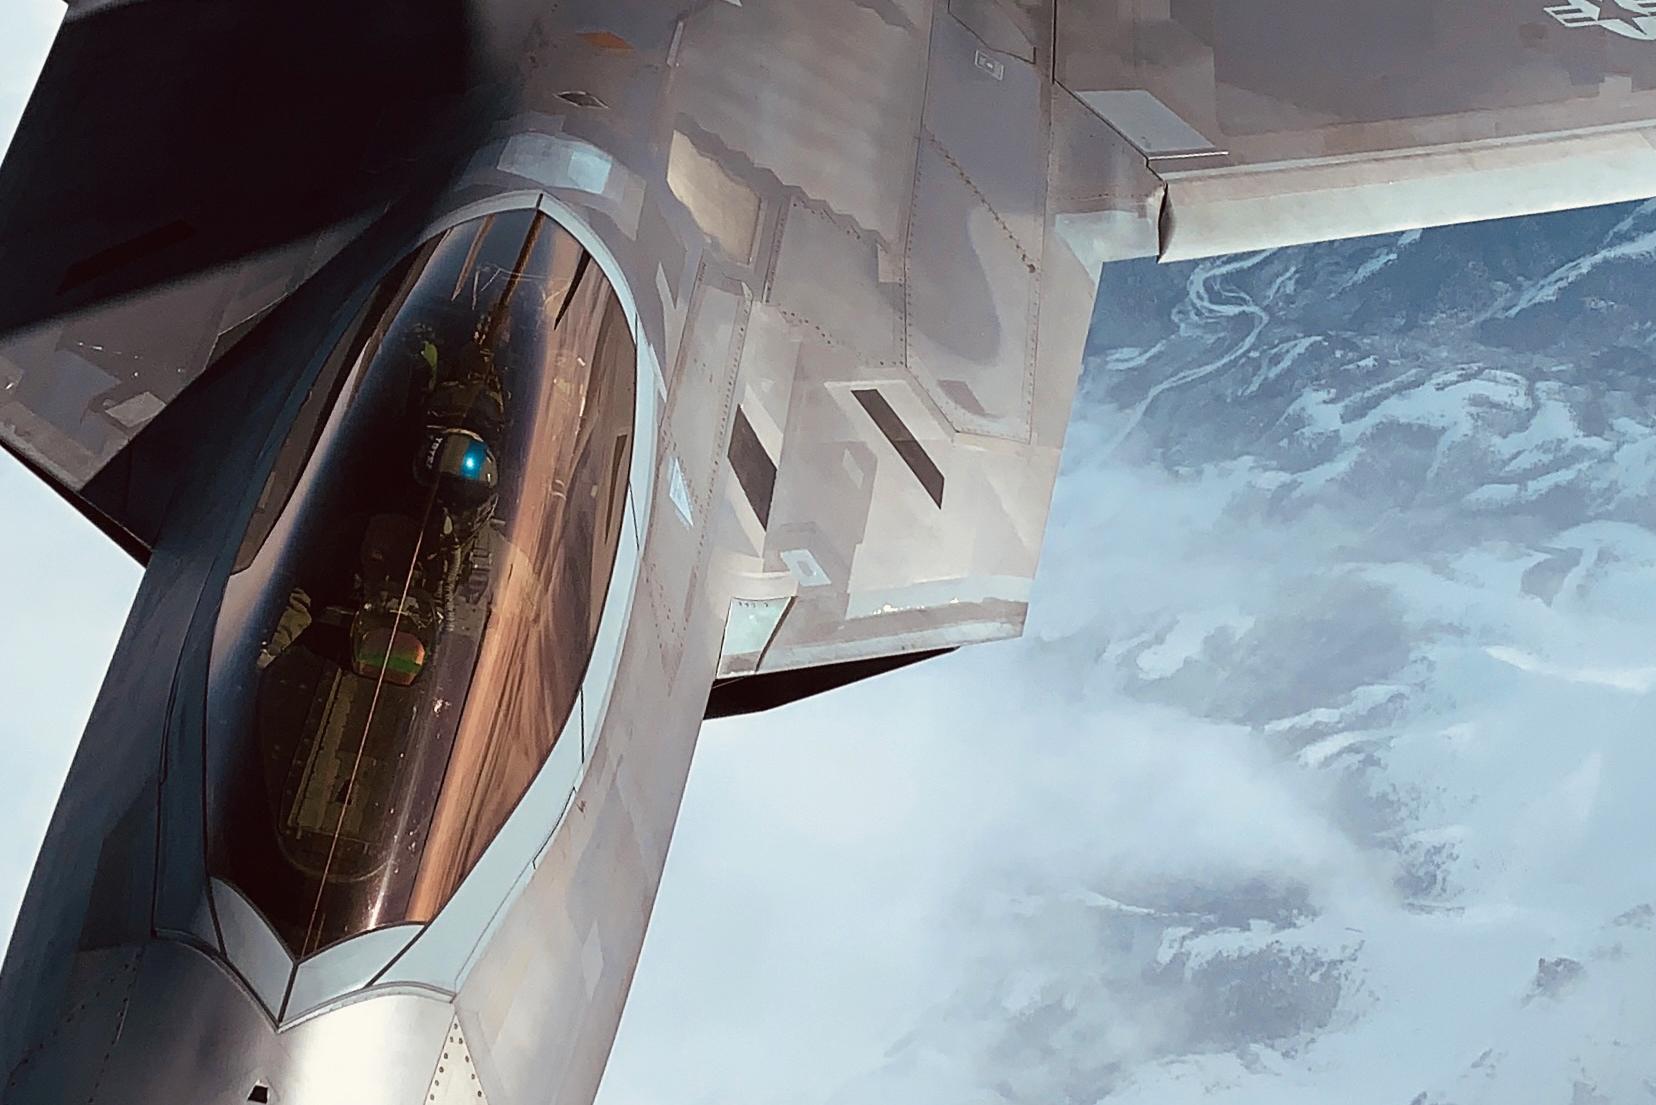 A KC-135 Stratotanker to refuel an F-22 Raptor from Joint Base Elmendorf-Richardson, Alaska, April, 13, 2021. (Master Sgt. Natalie Stanley/Air National Guard)